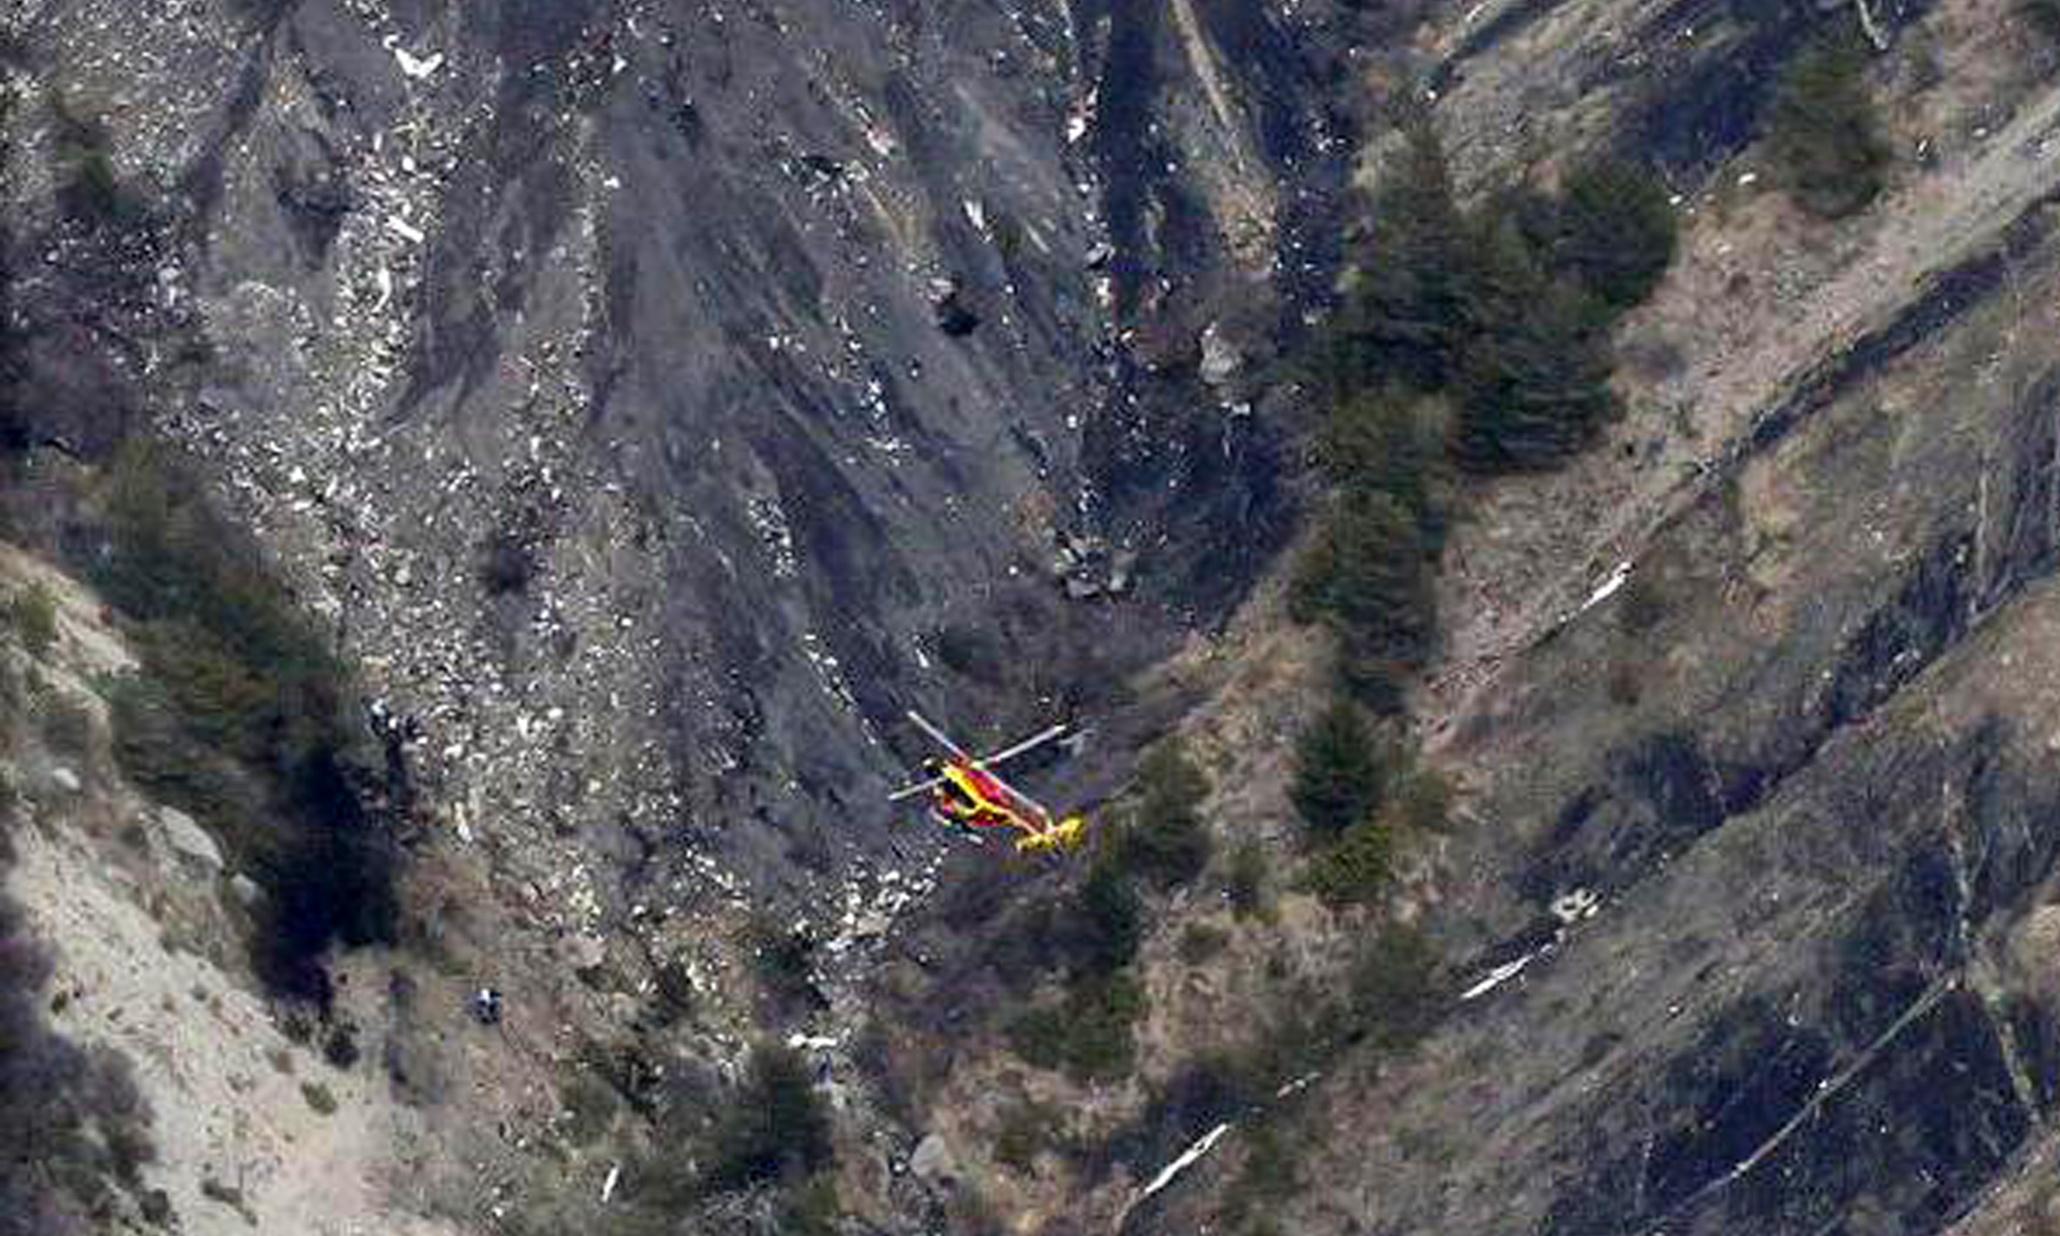 Germanwings plane black box found as mystery surrounds Alps crash